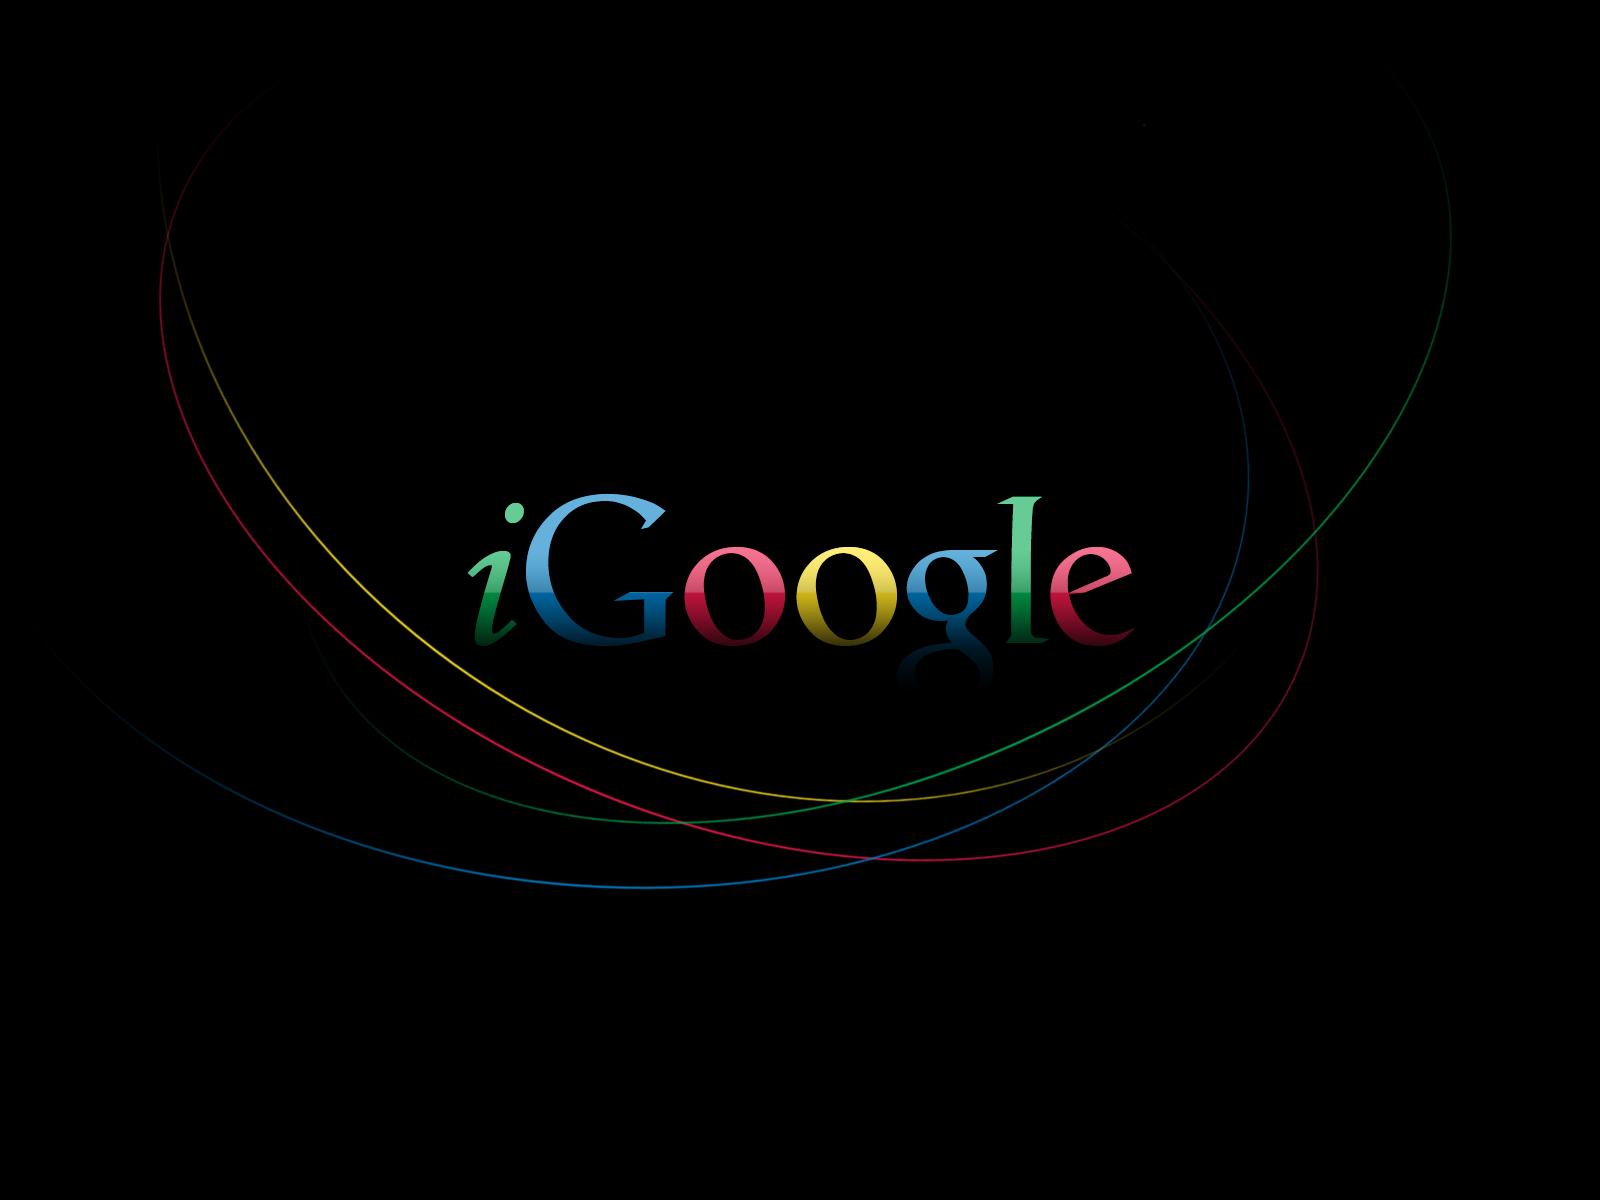 custom google wallpaper images google homepage background